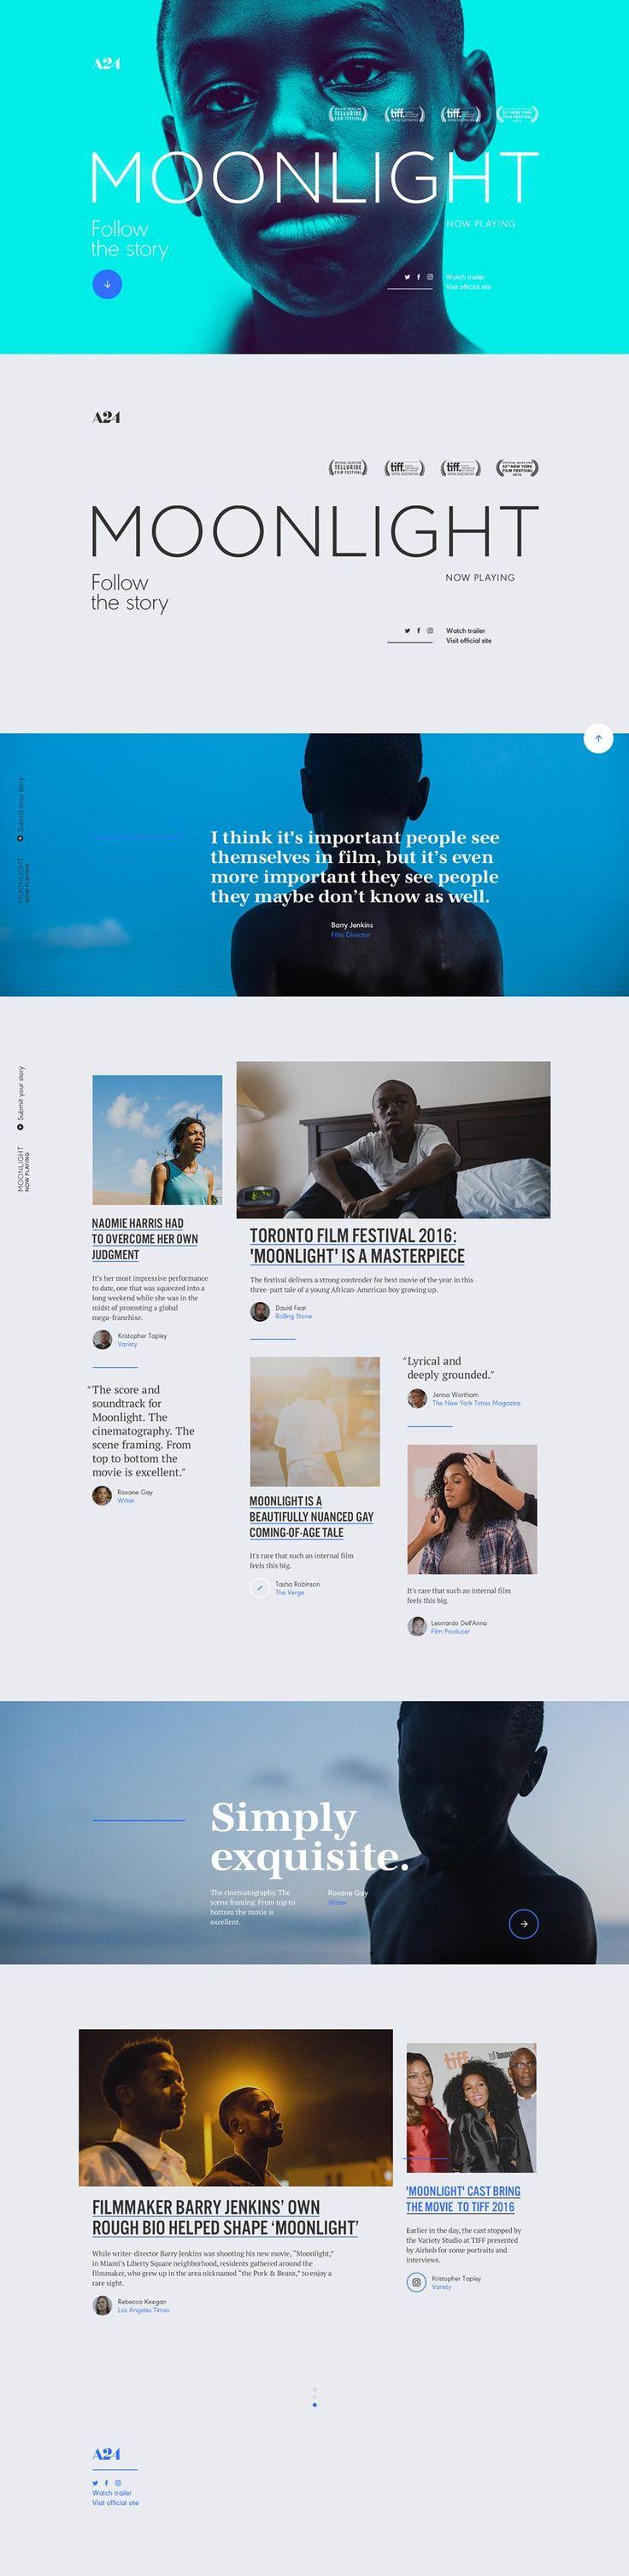 Moonlight Film Movie Website - Behance #ui #ux#userexperience #website #webdesign #design